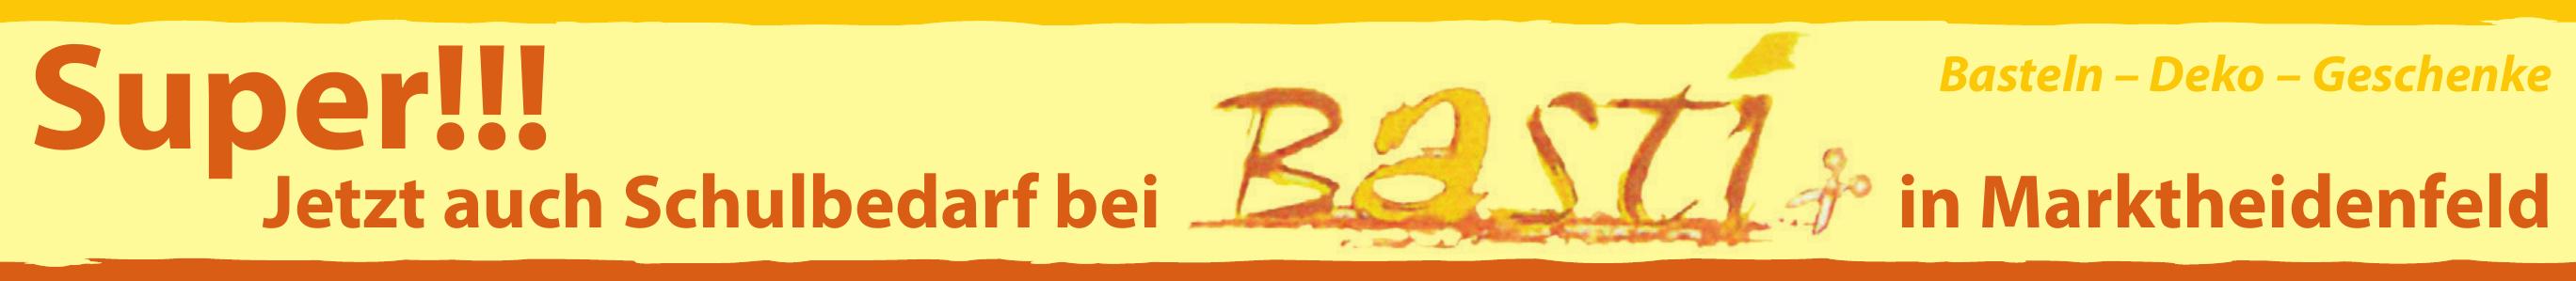 Basti erweitert Sortiment um Schulwaren Image 1